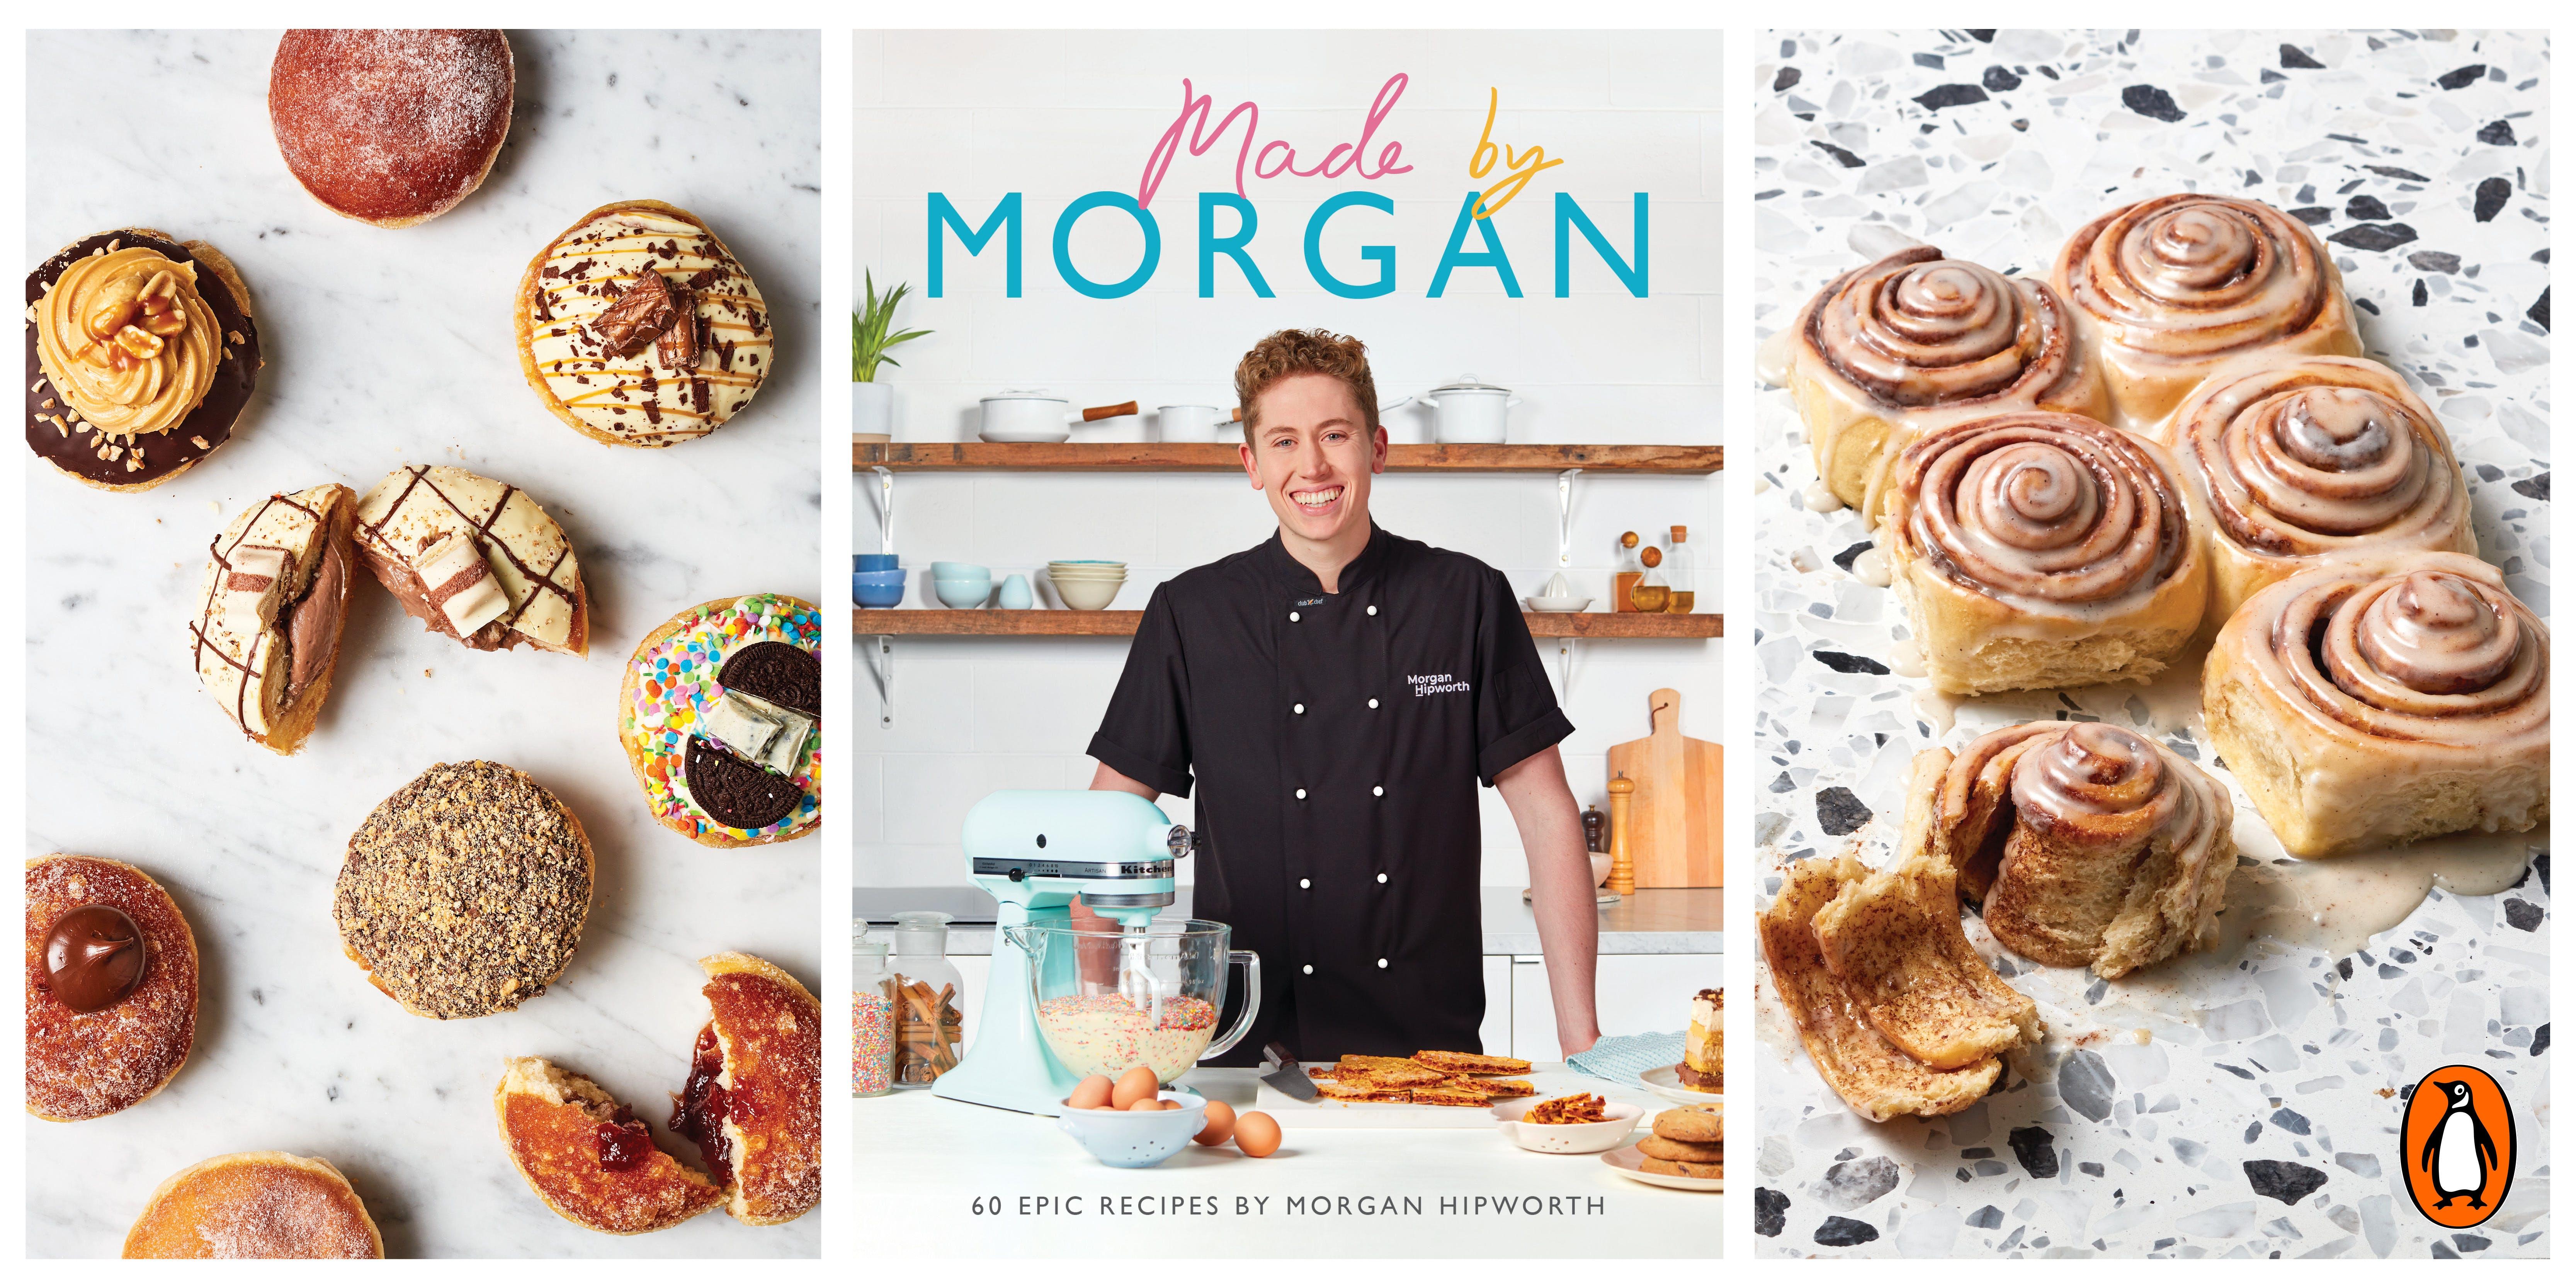 Morgan's TikTok-famous recipes